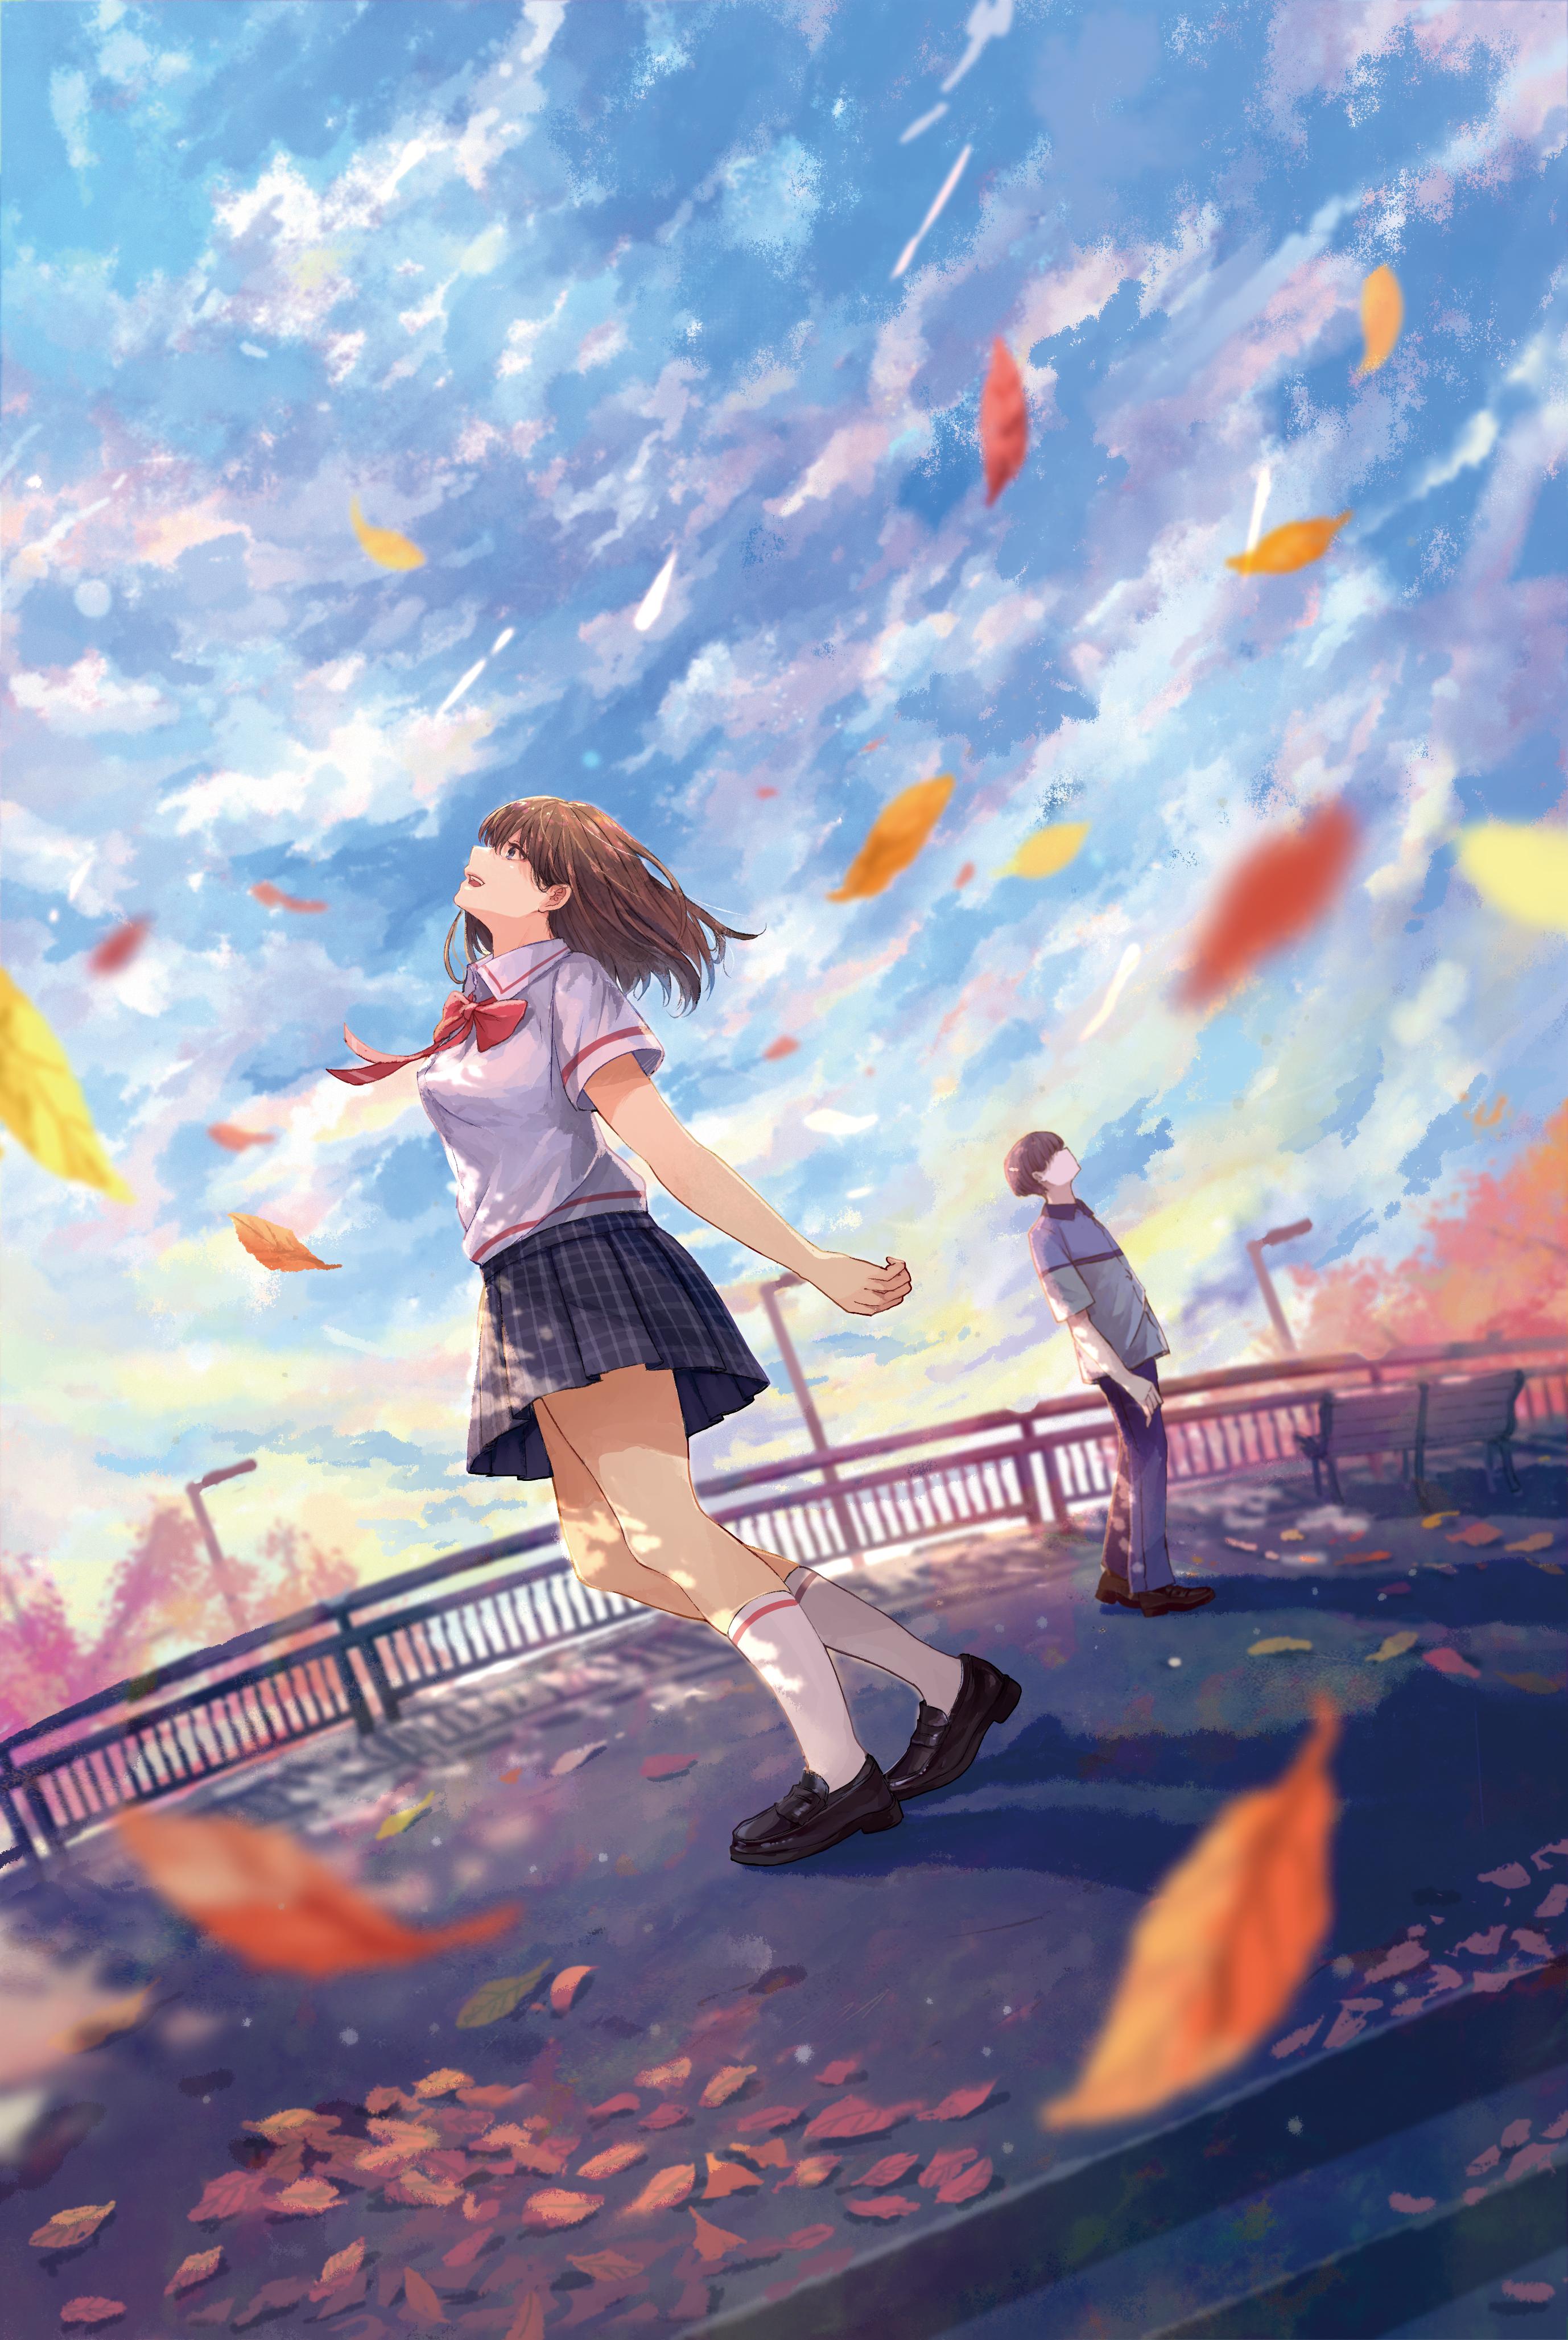 Under The Same Blue Sky きみがいれば空はただ青く Anime Scenery Sky Anime Anime Cupples